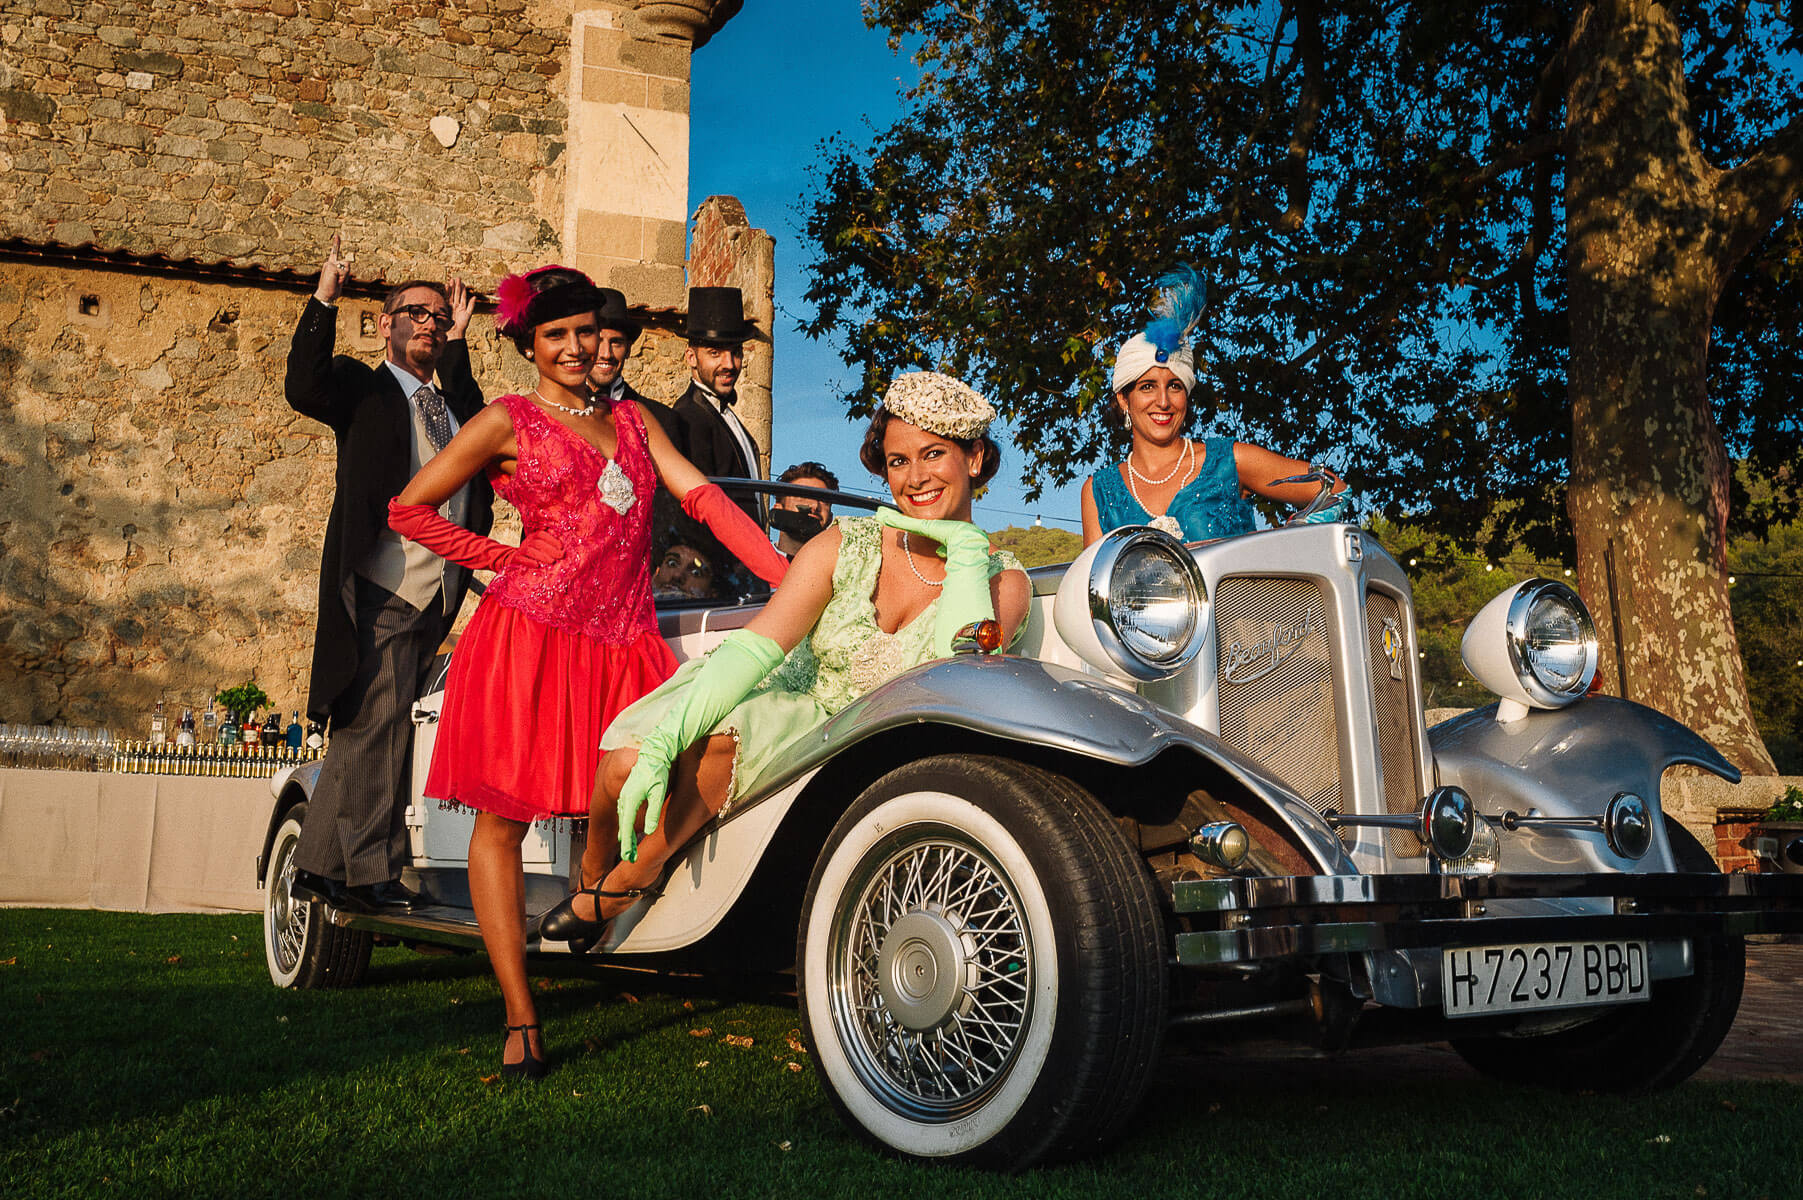 Boda Cris & Juanca coche clásico | Manel Tamayo, Wedding photographer